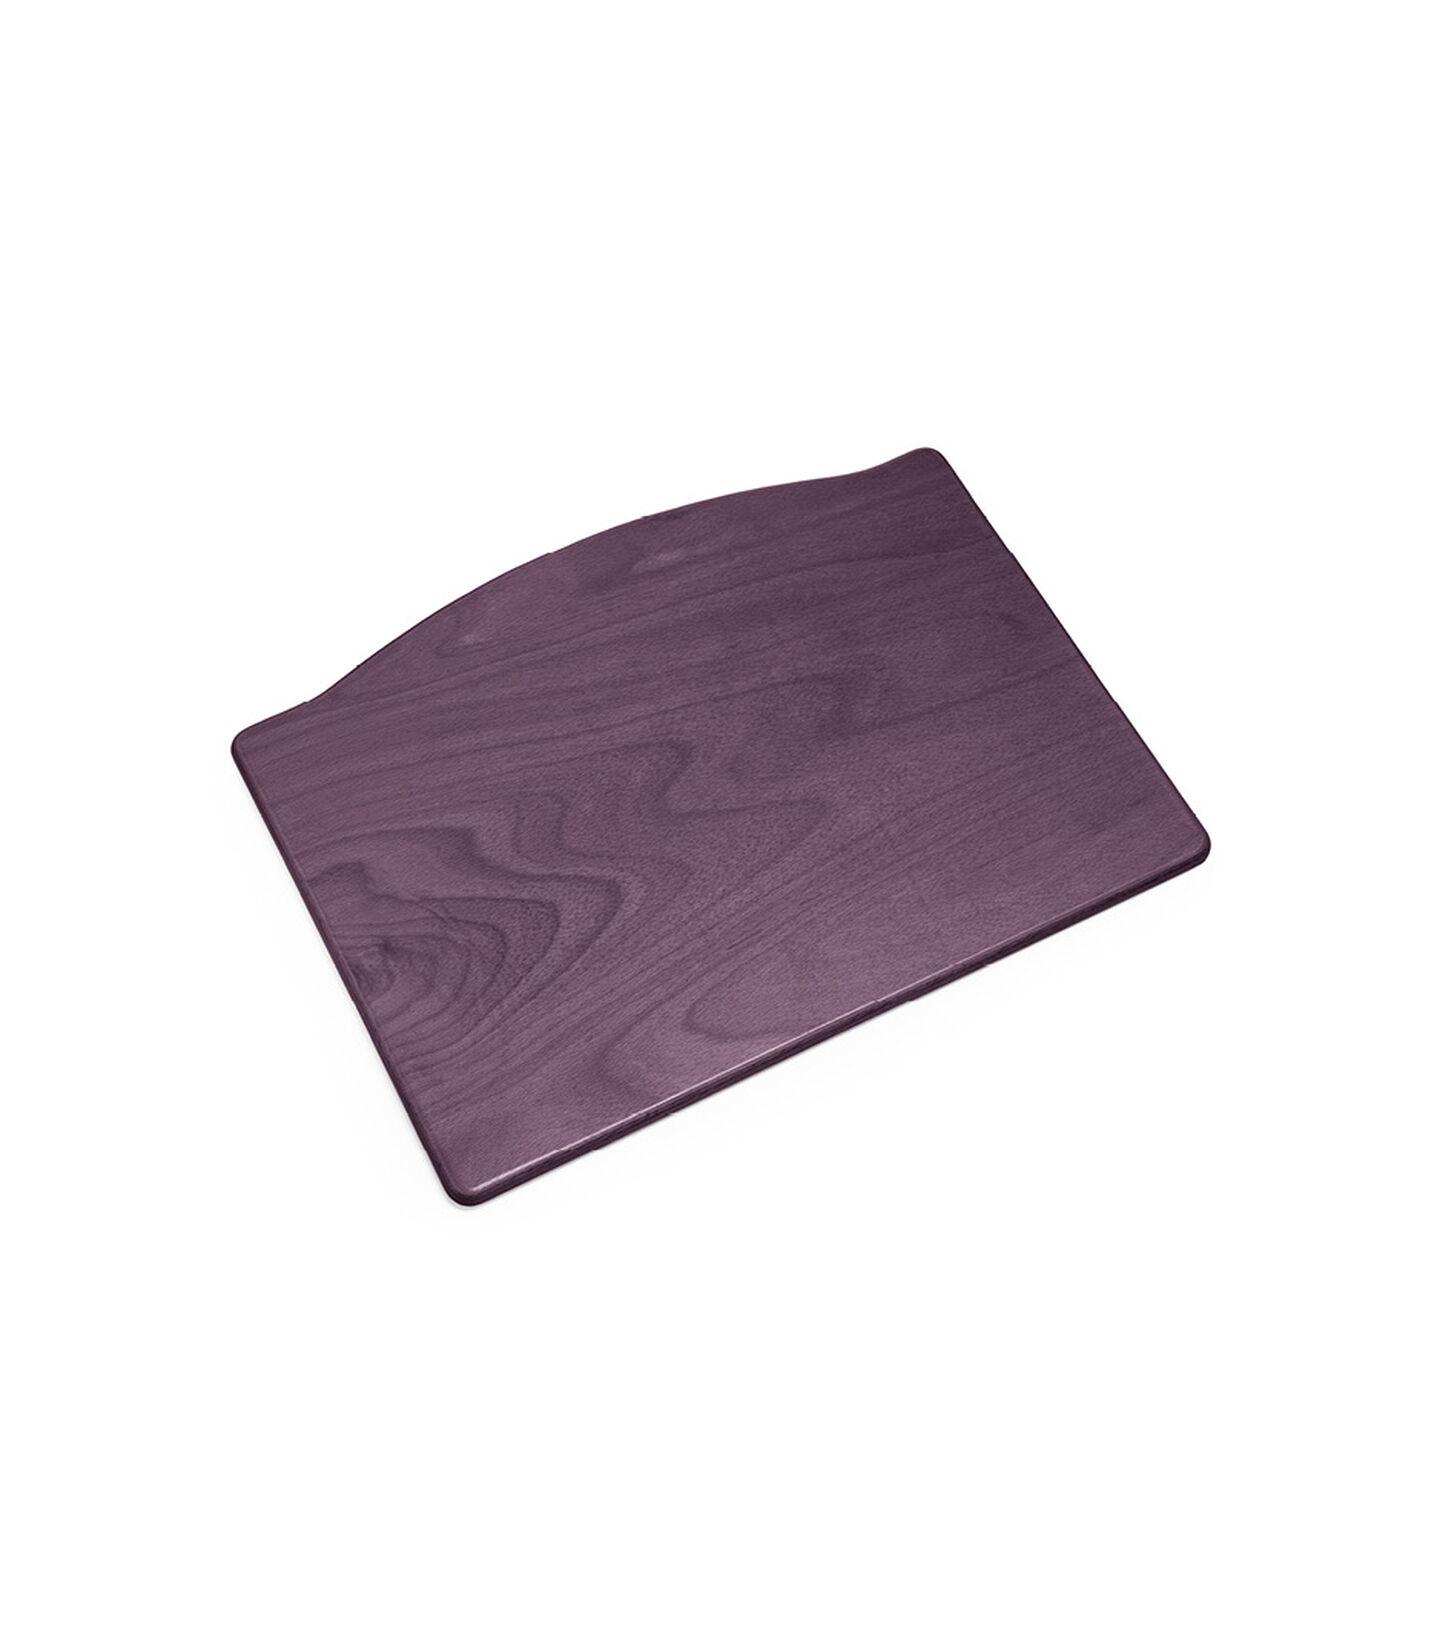 Tripp Trapp® Footplate Plum Purple, Plum Purple, mainview view 2